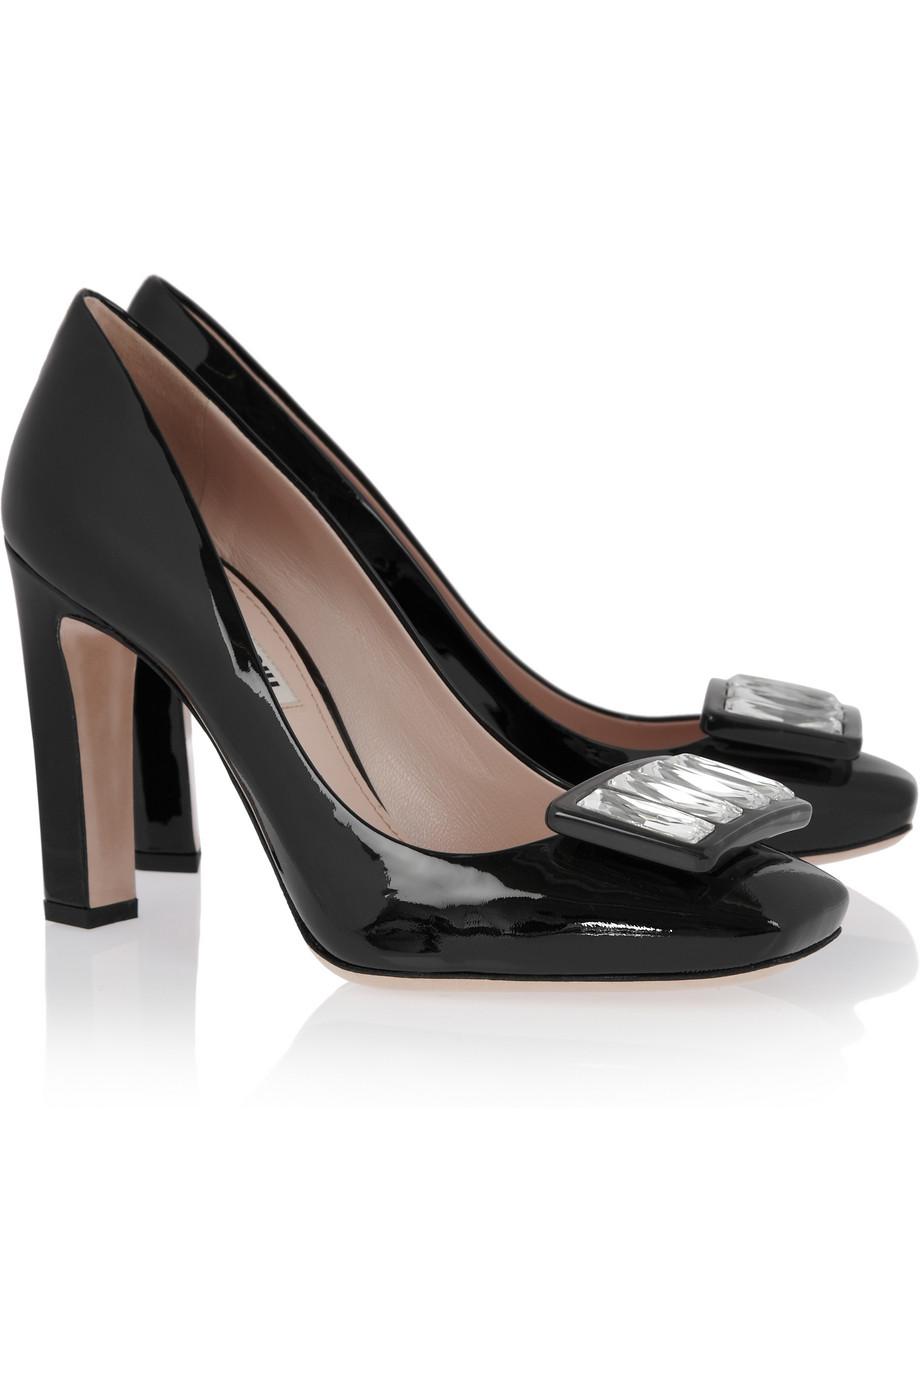 Miu Miu Womens Crystal-embellished patent-leather pumps